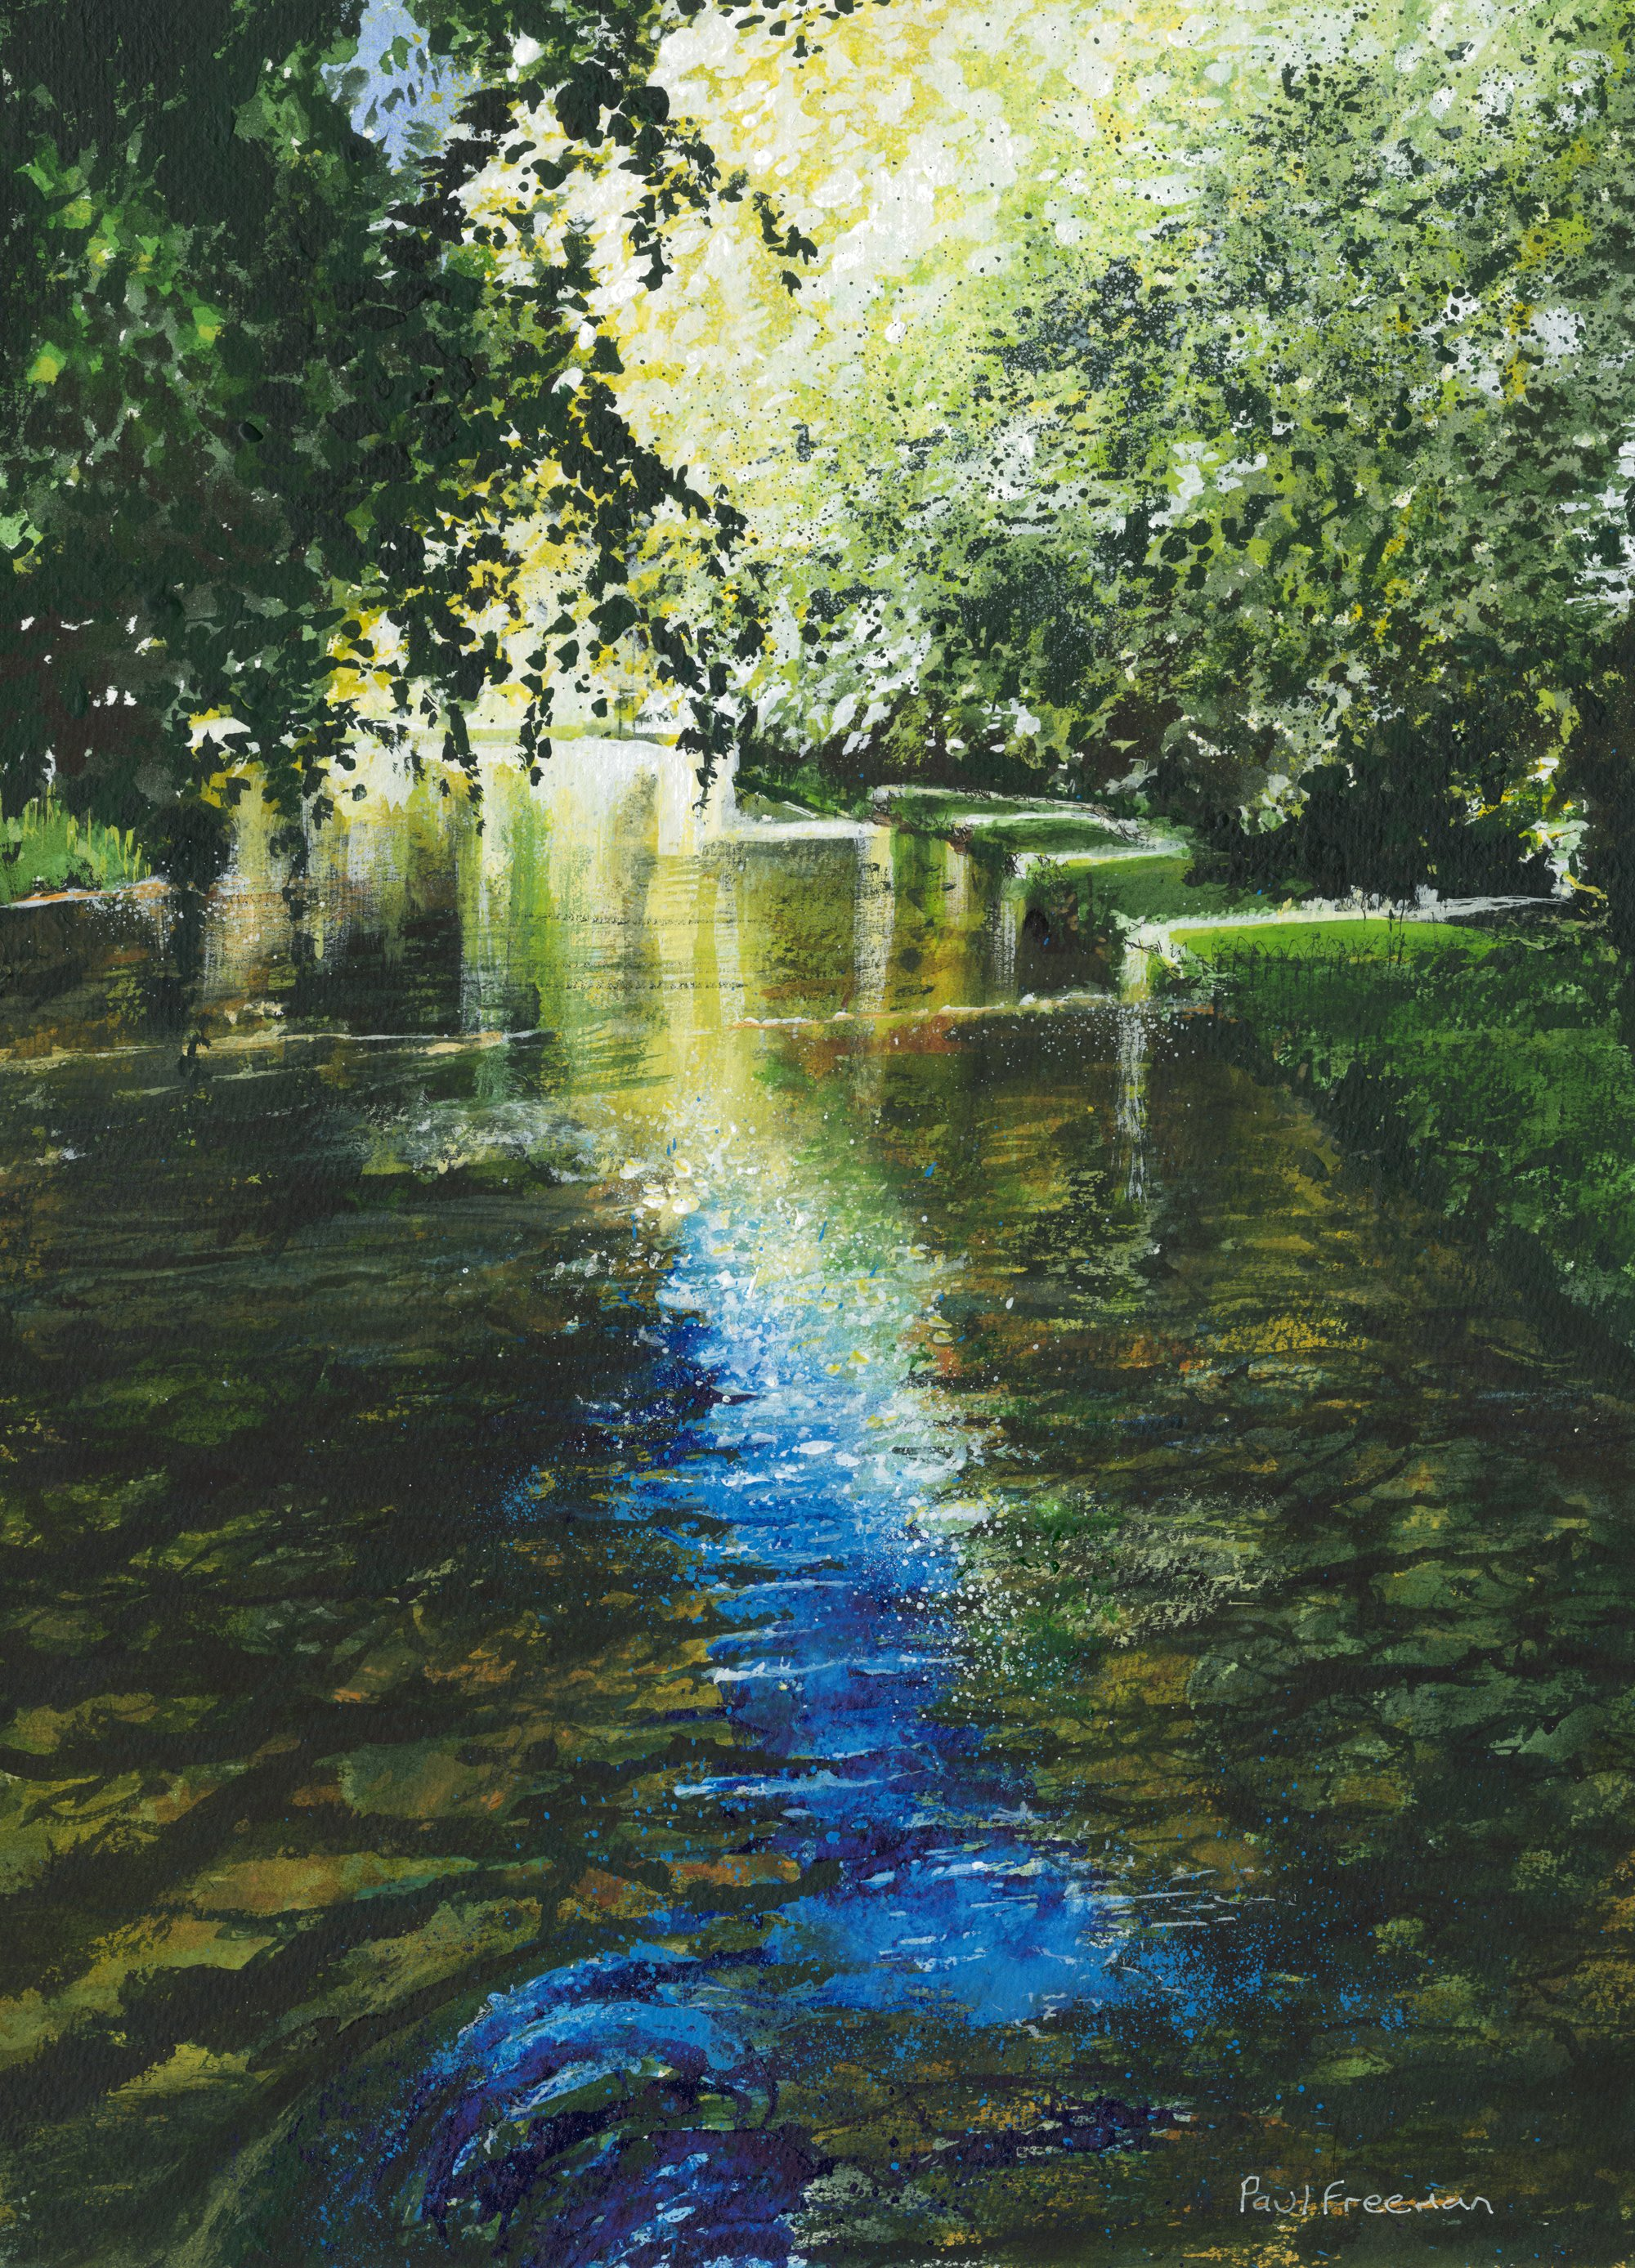 The River Test Original Landscape Art